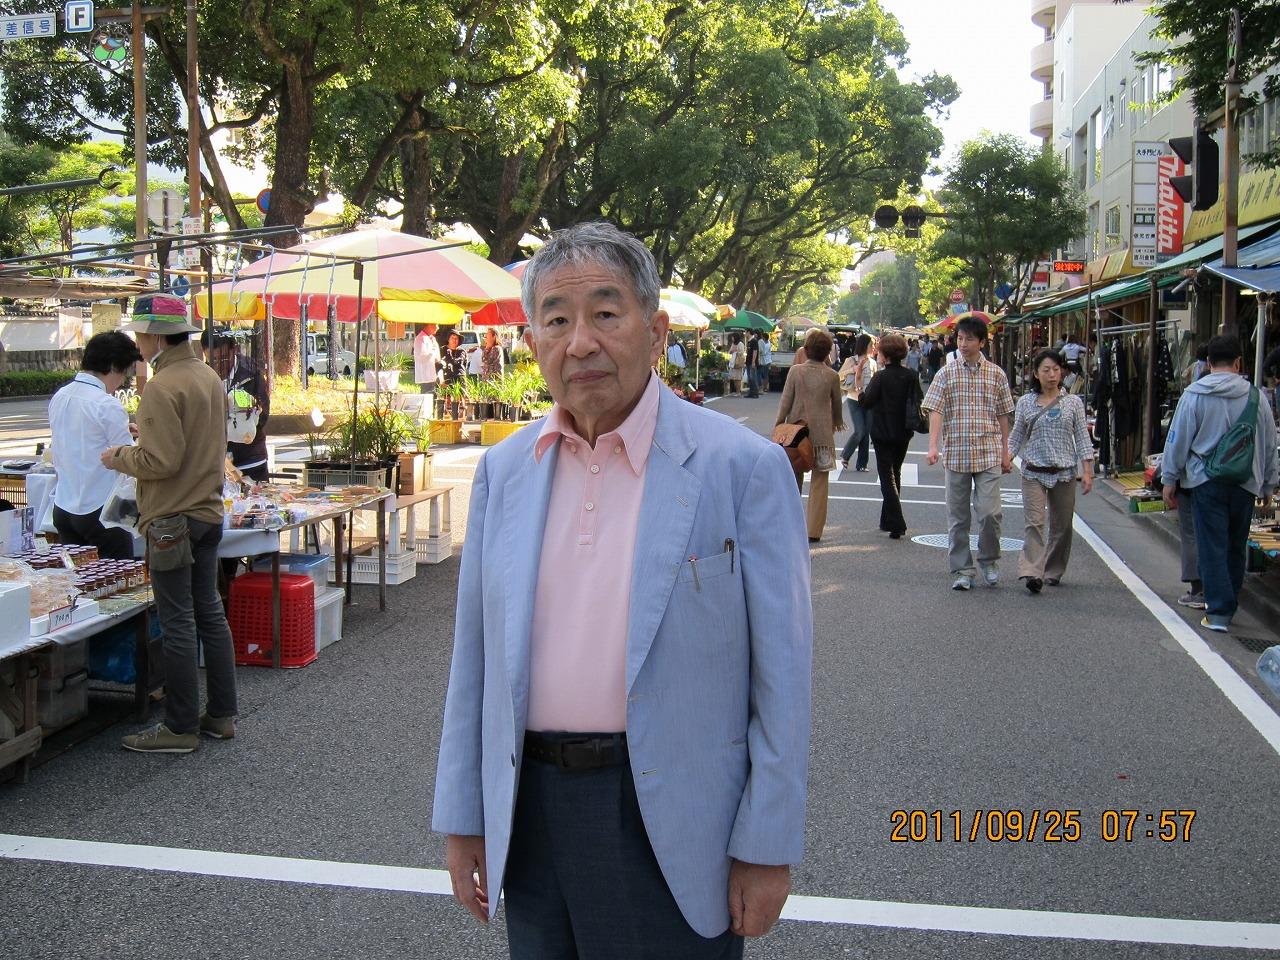 http://www.law-pro.jp/weblog/%E6%97%A5%E6%9B%9C%E5%B8%82.jpg